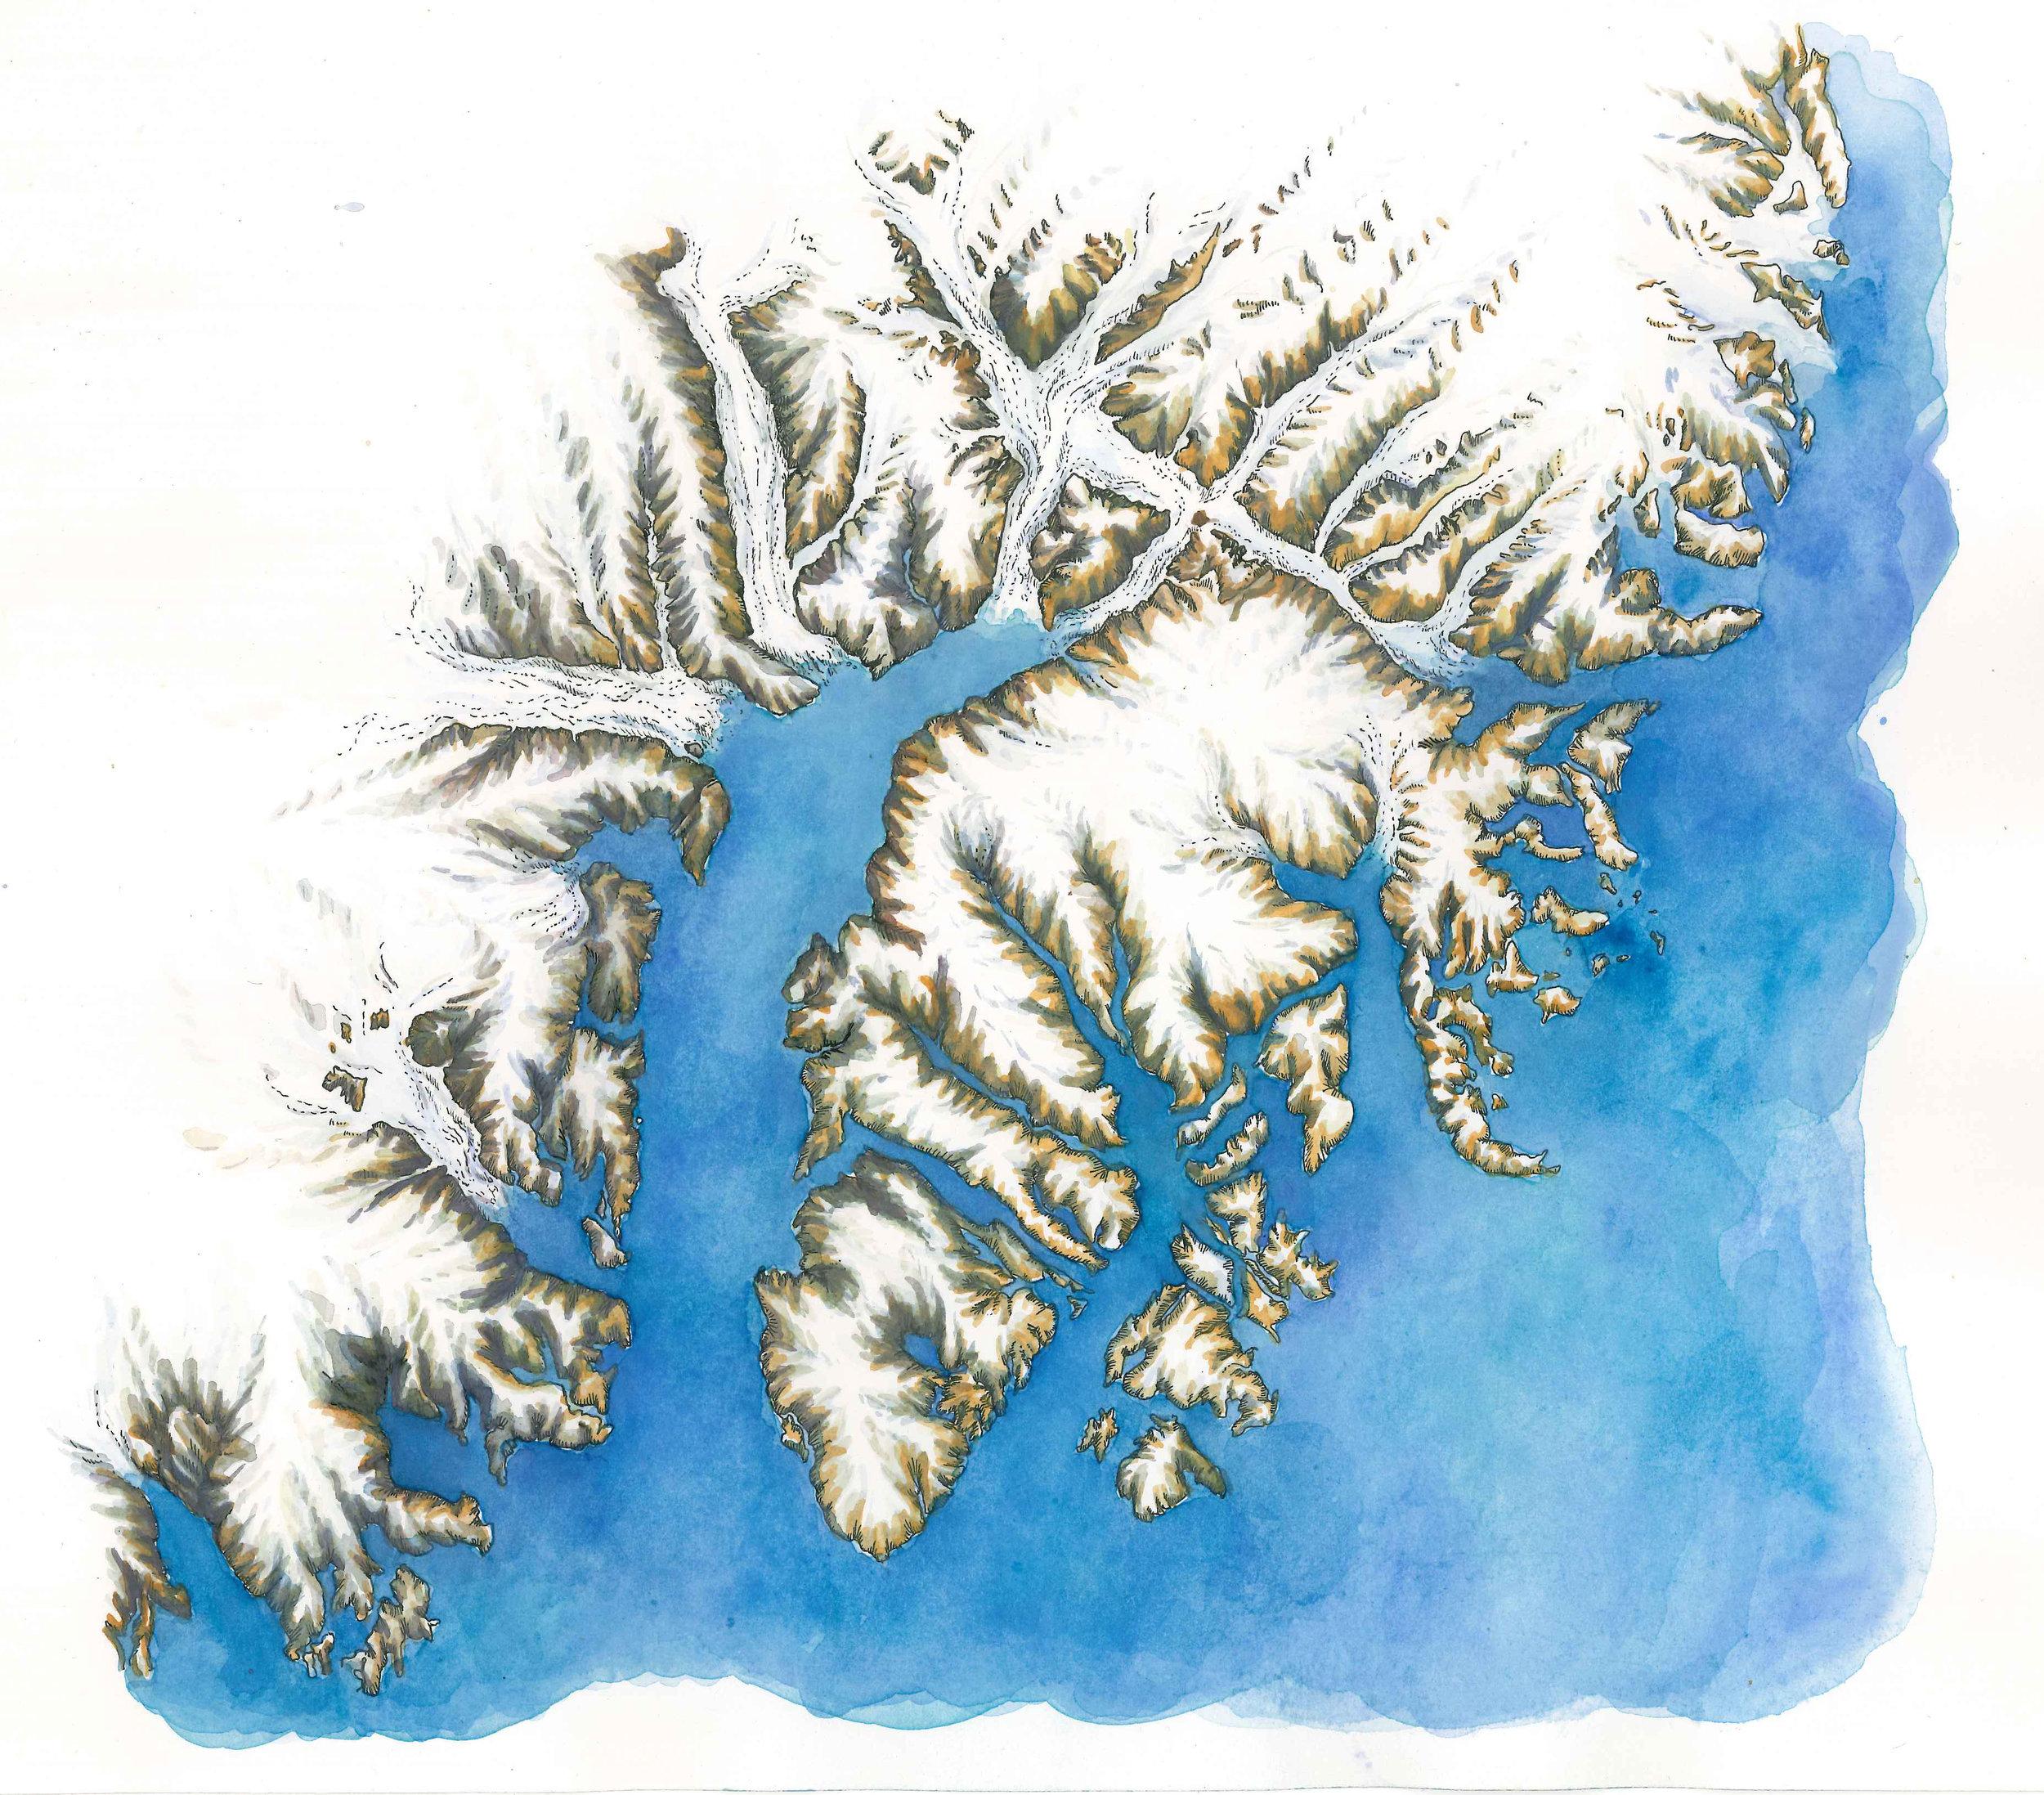 GreenlandInset_0607_COPY.jpg